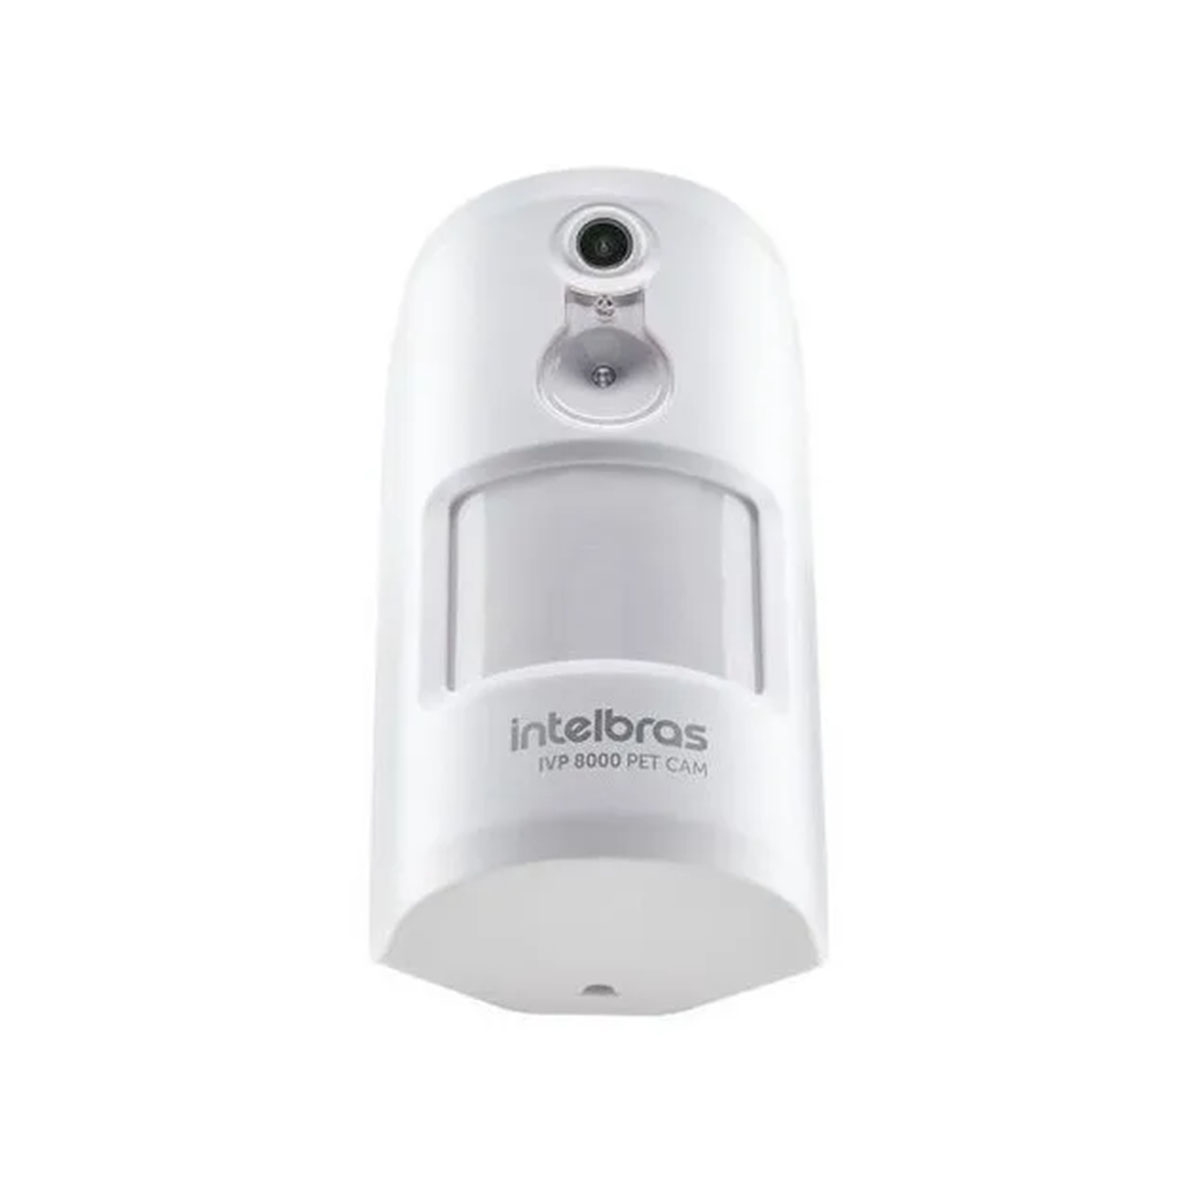 Kit 06 Sensor Passivo Sem Fio Intelbras Ivp 8000 Pet Cam